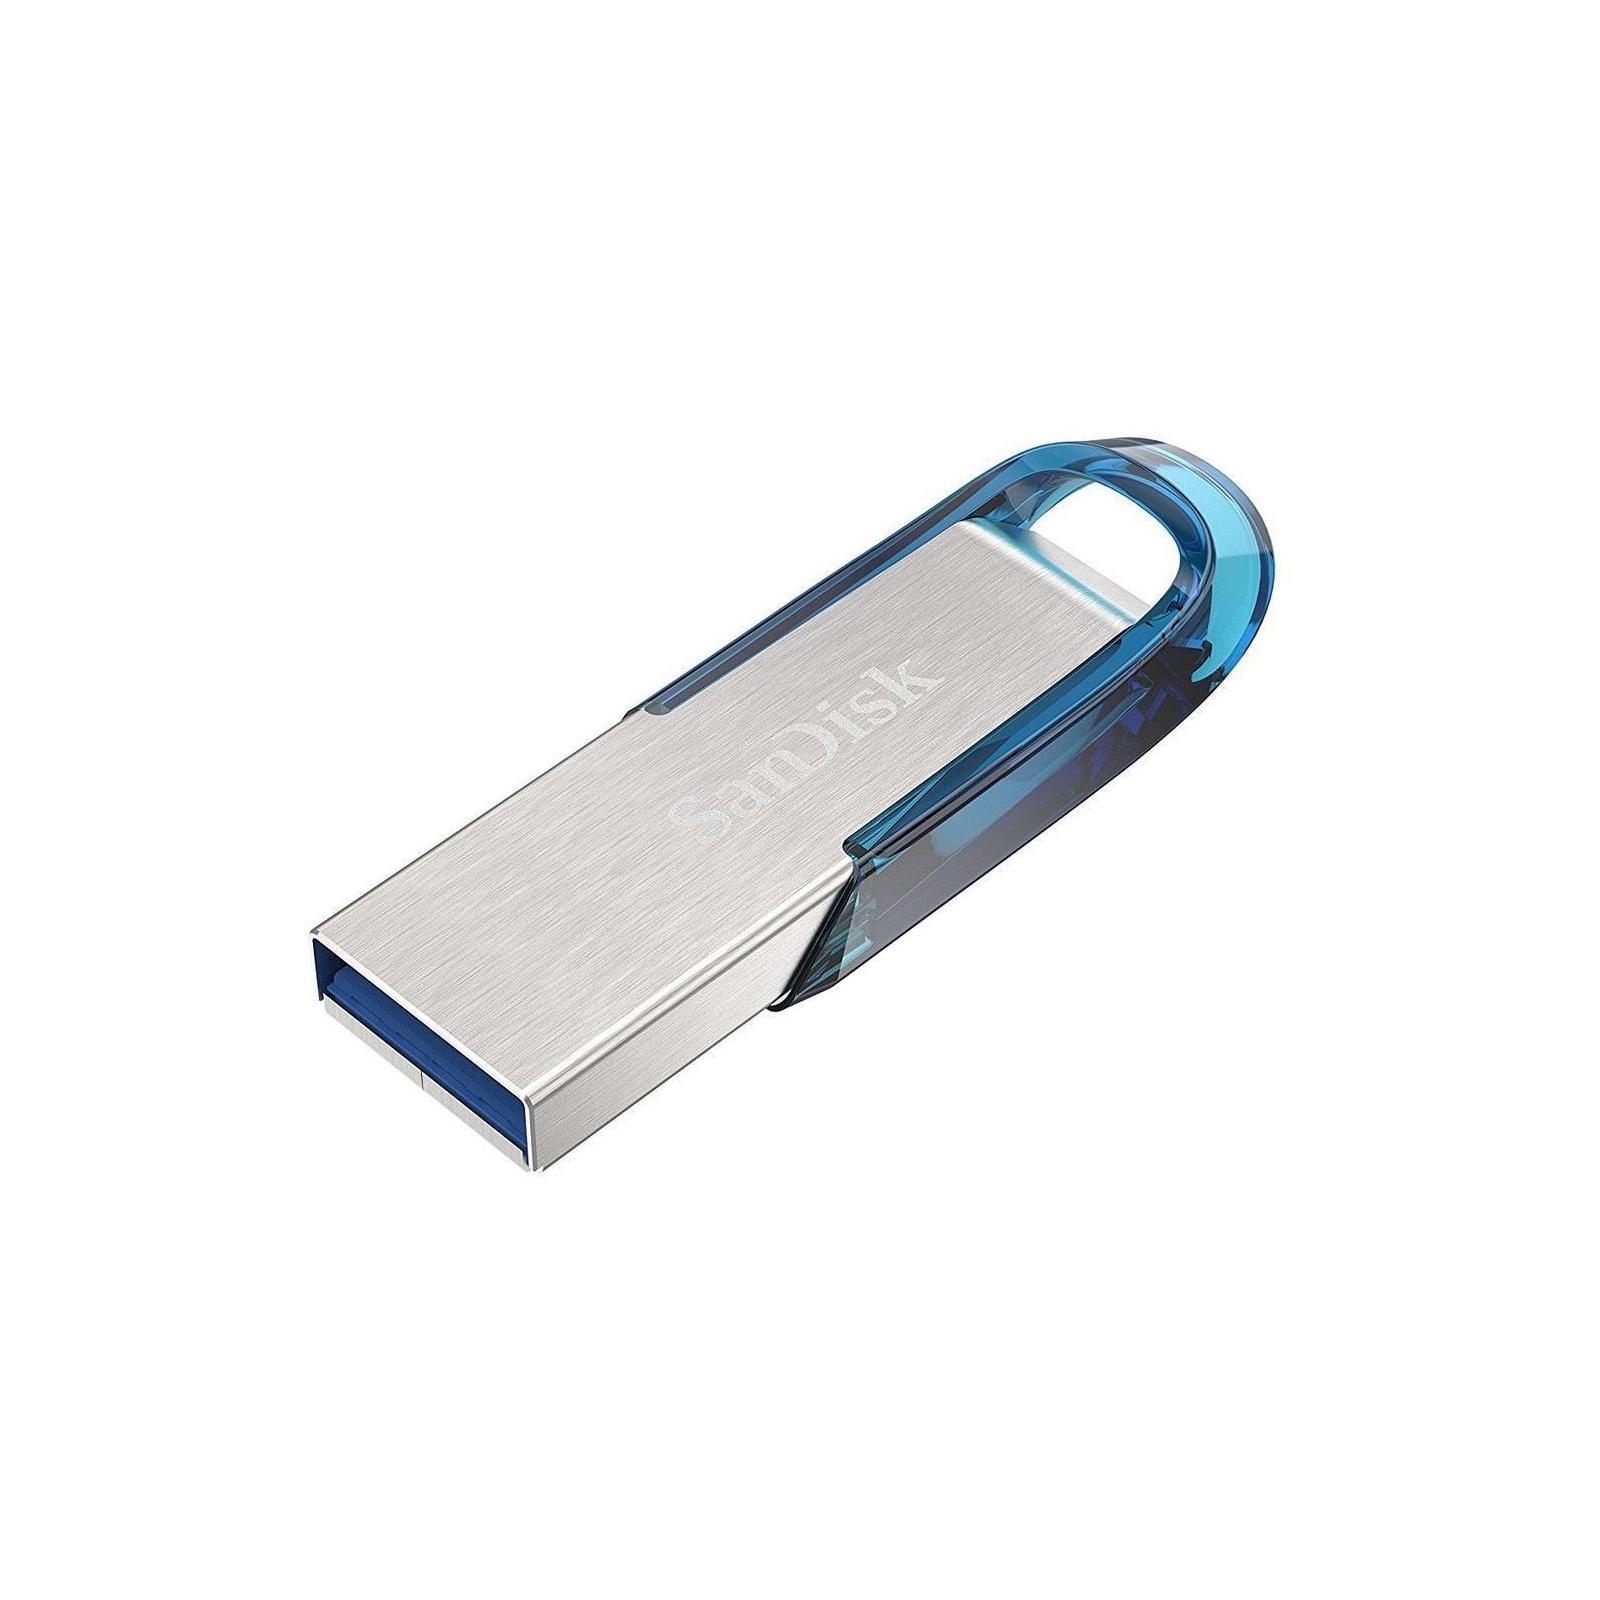 USB флеш накопитель SANDISK 32GB Ultra Flair USB 3.0 (SDCZ73-032G-G46) изображение 2